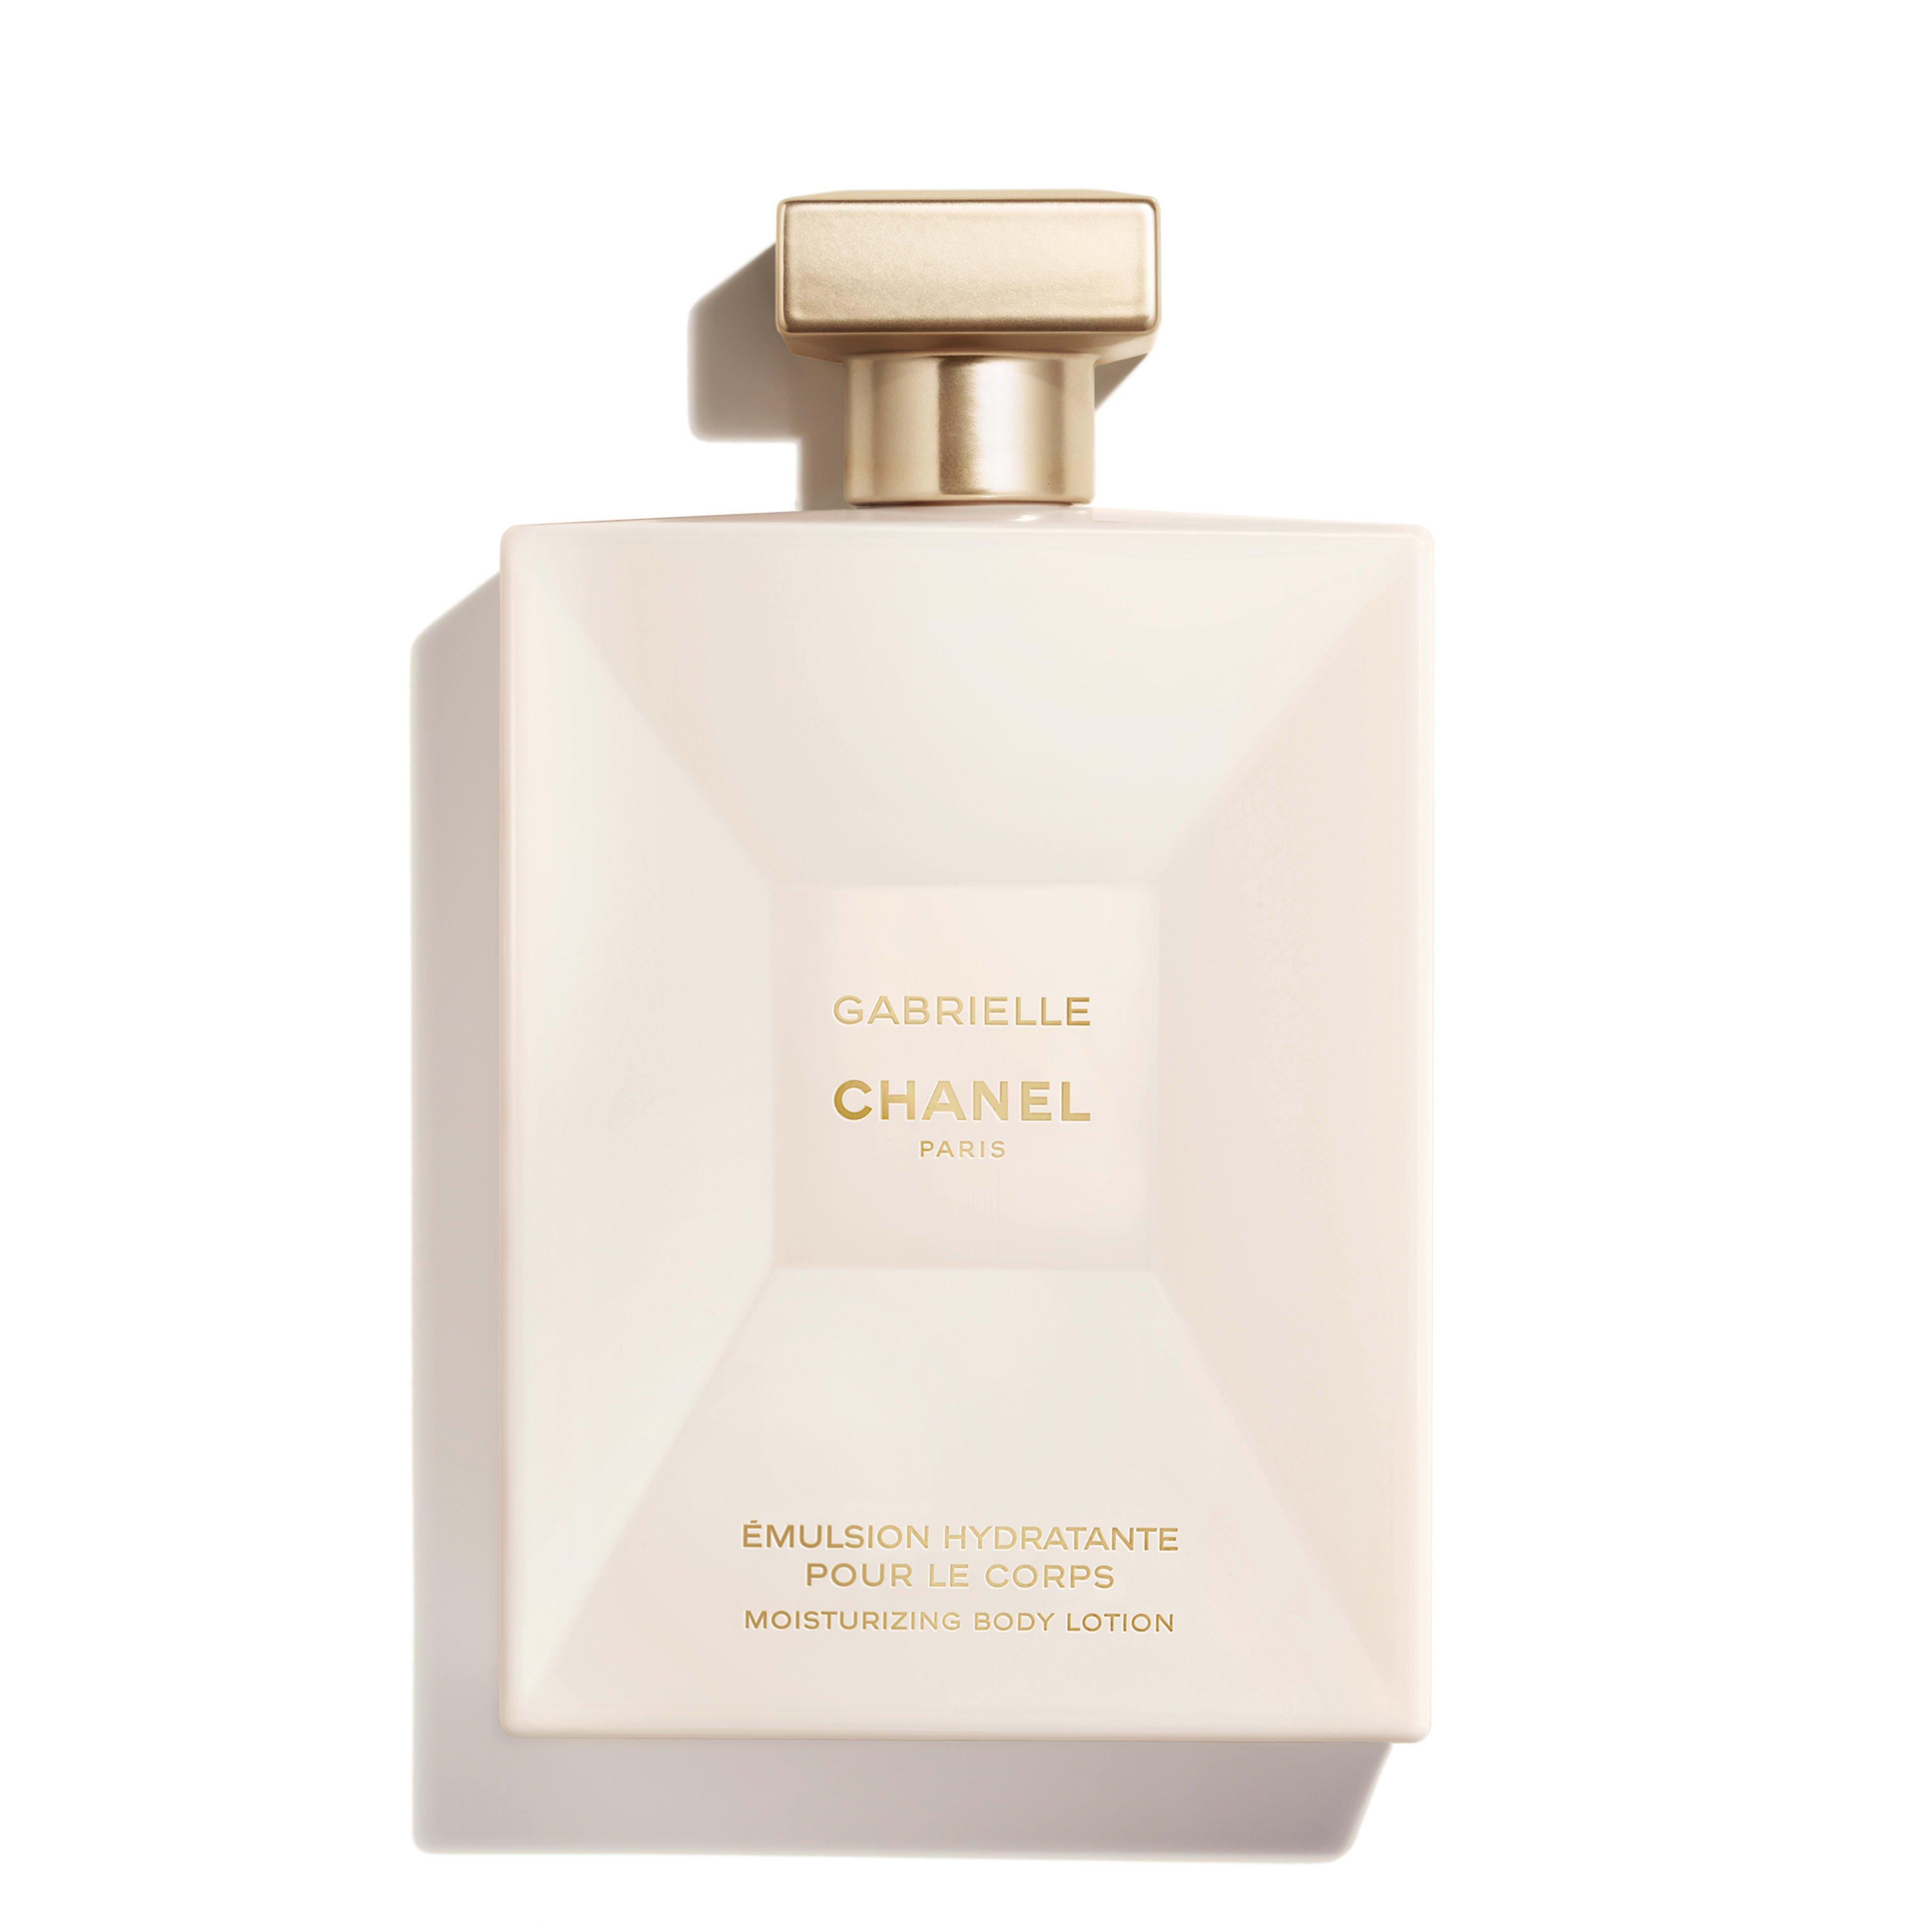 GABRIELLE CHANEL - fragrance Perfume